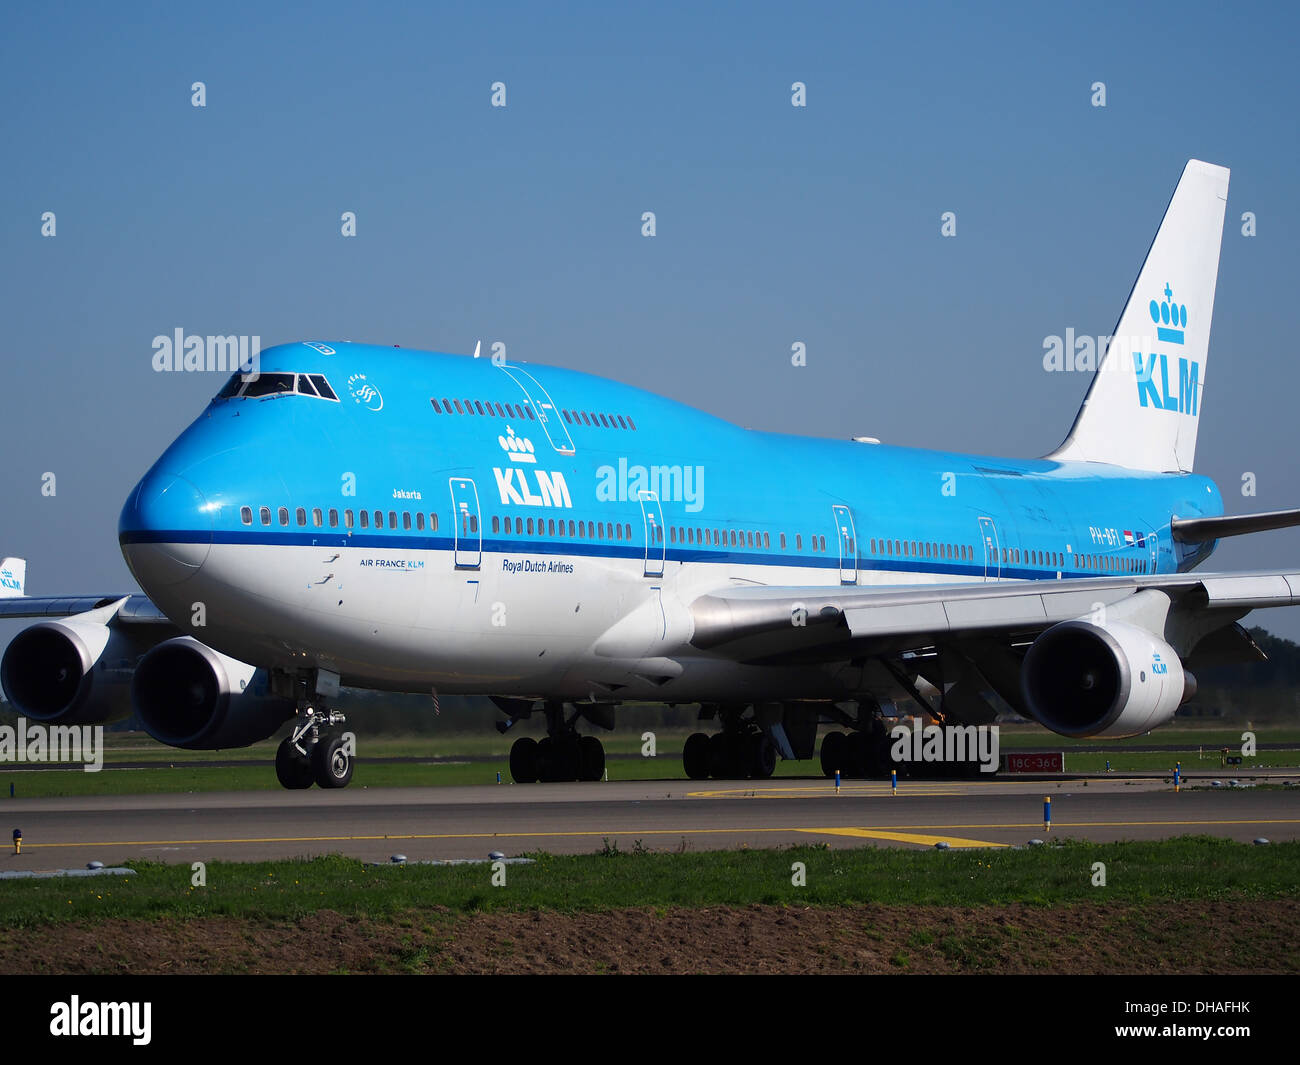 PH-BFI KLM Royal Dutch Airlines Boeing 747-406(M) - cn 25086 pic2 - Stock Image